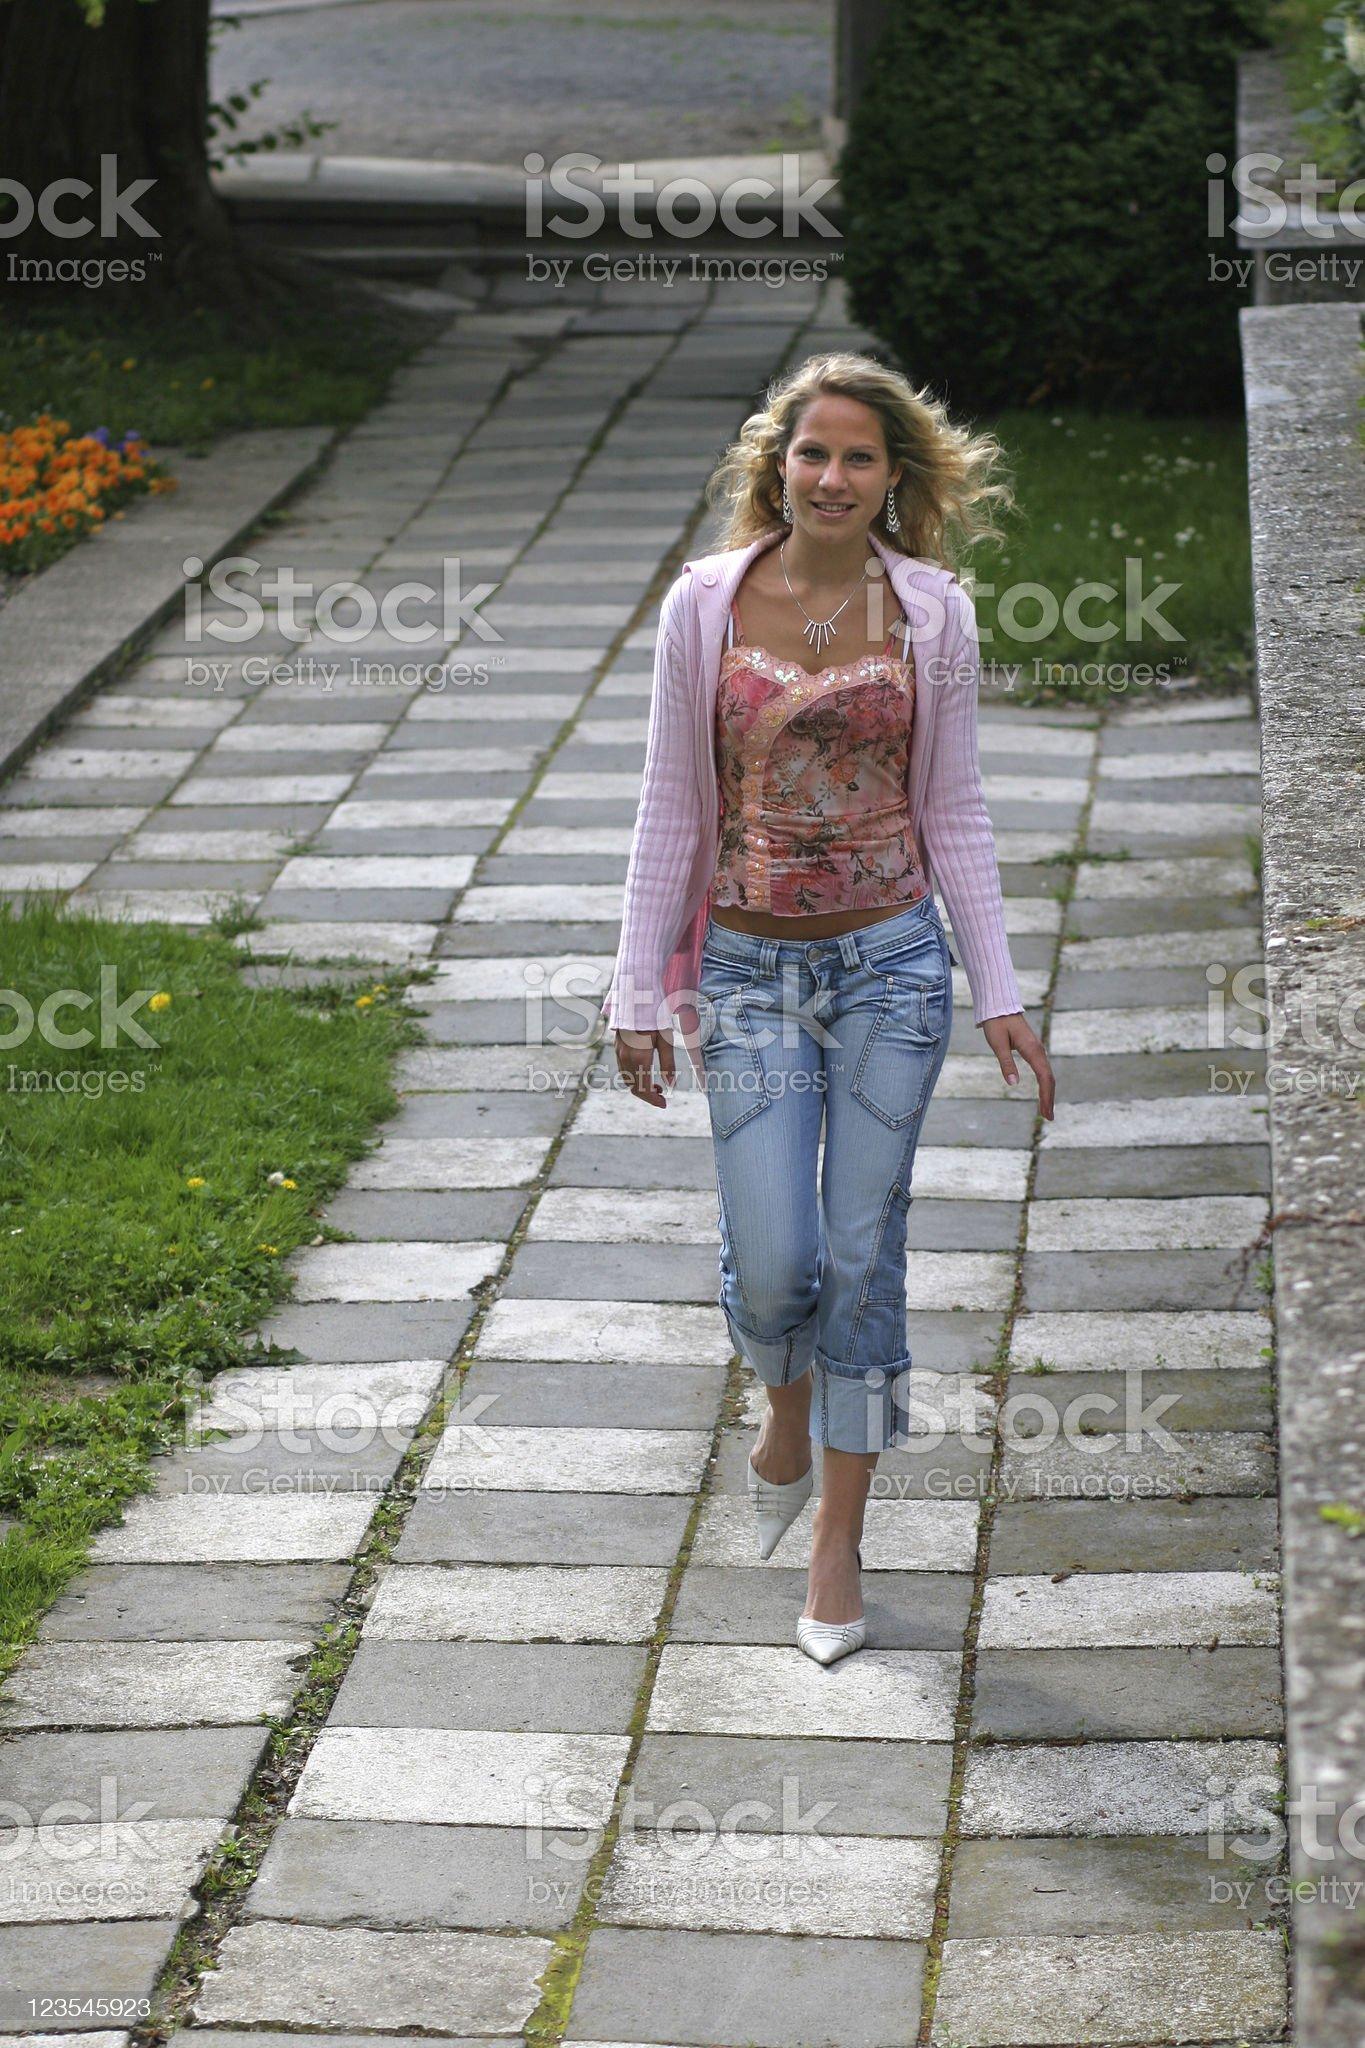 Walking fashion royalty-free stock photo